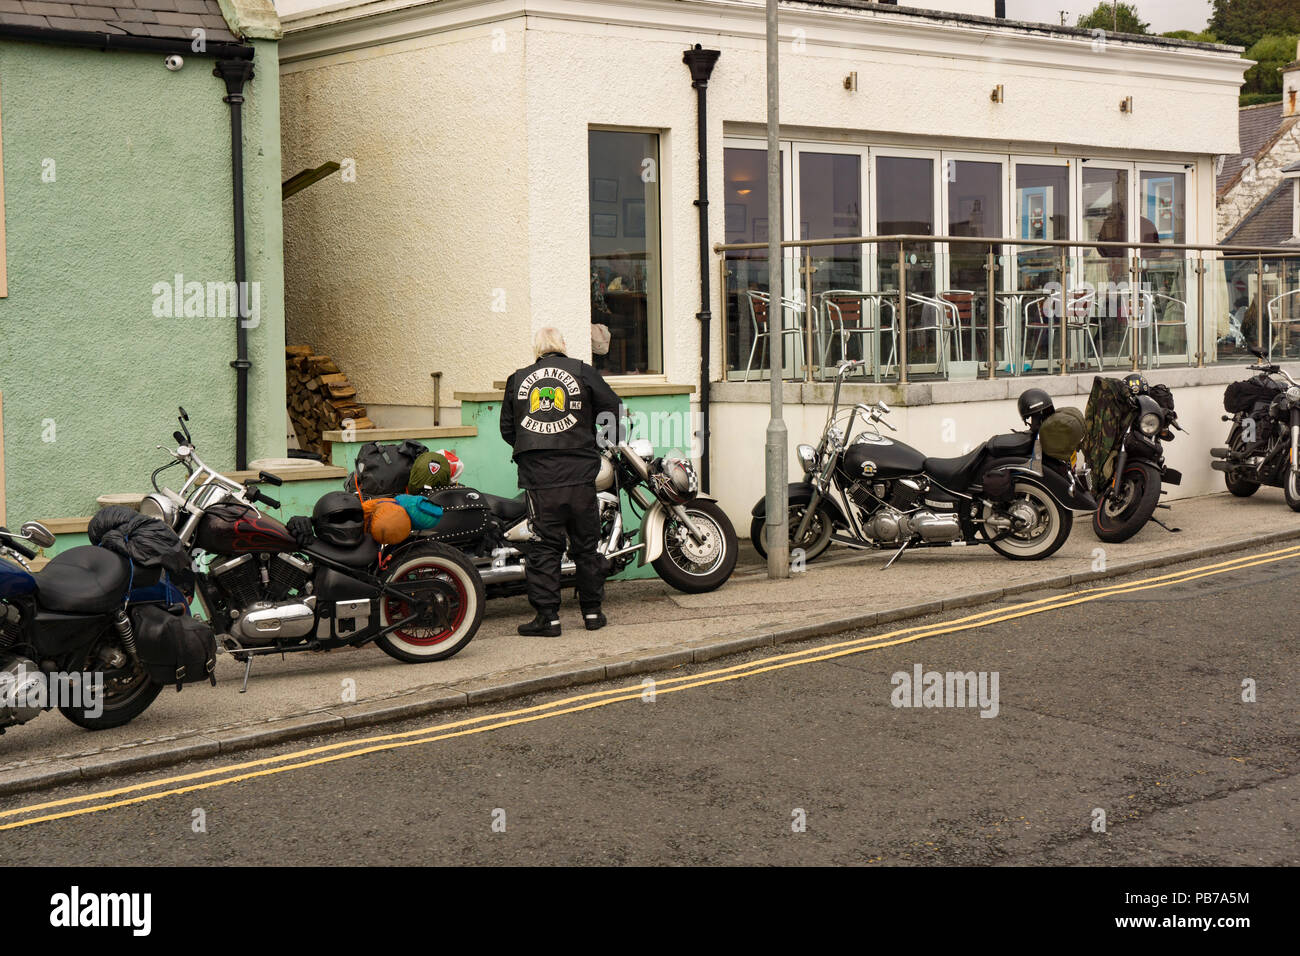 Motorbikes of the Blue Angels Motorbike Club at Port Patrick